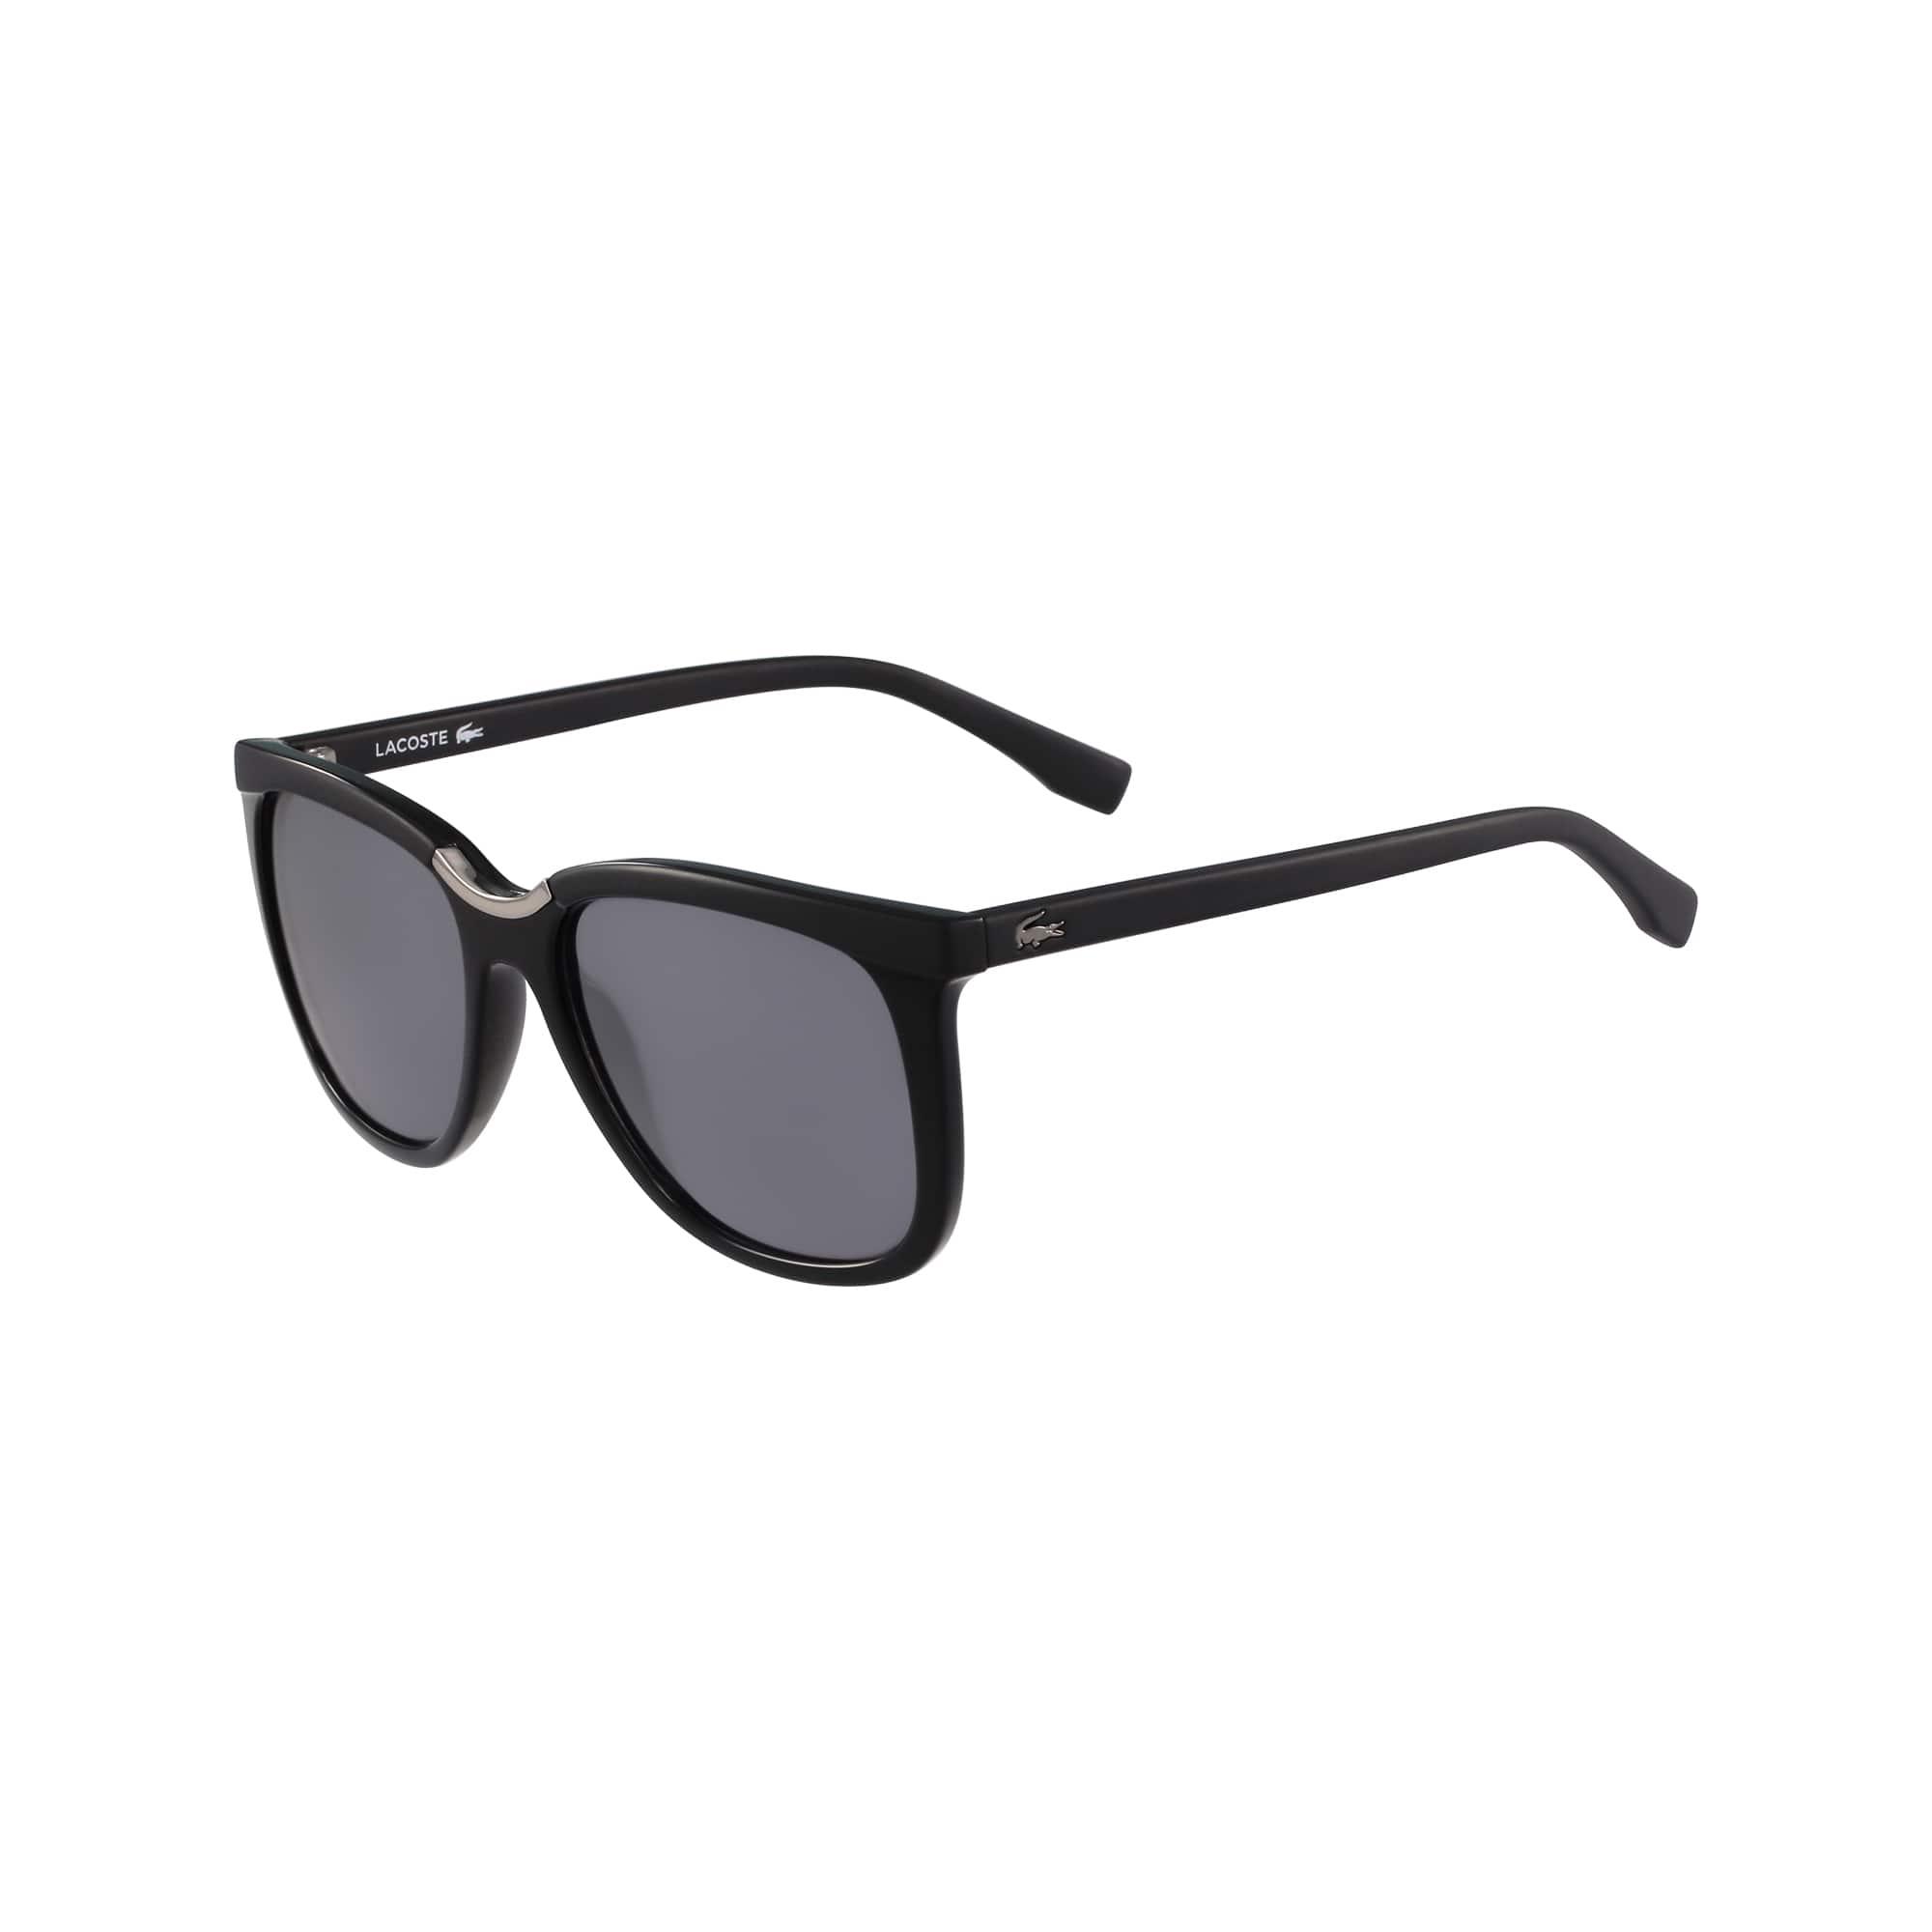 0a93dc415caa Sunglasses for Women